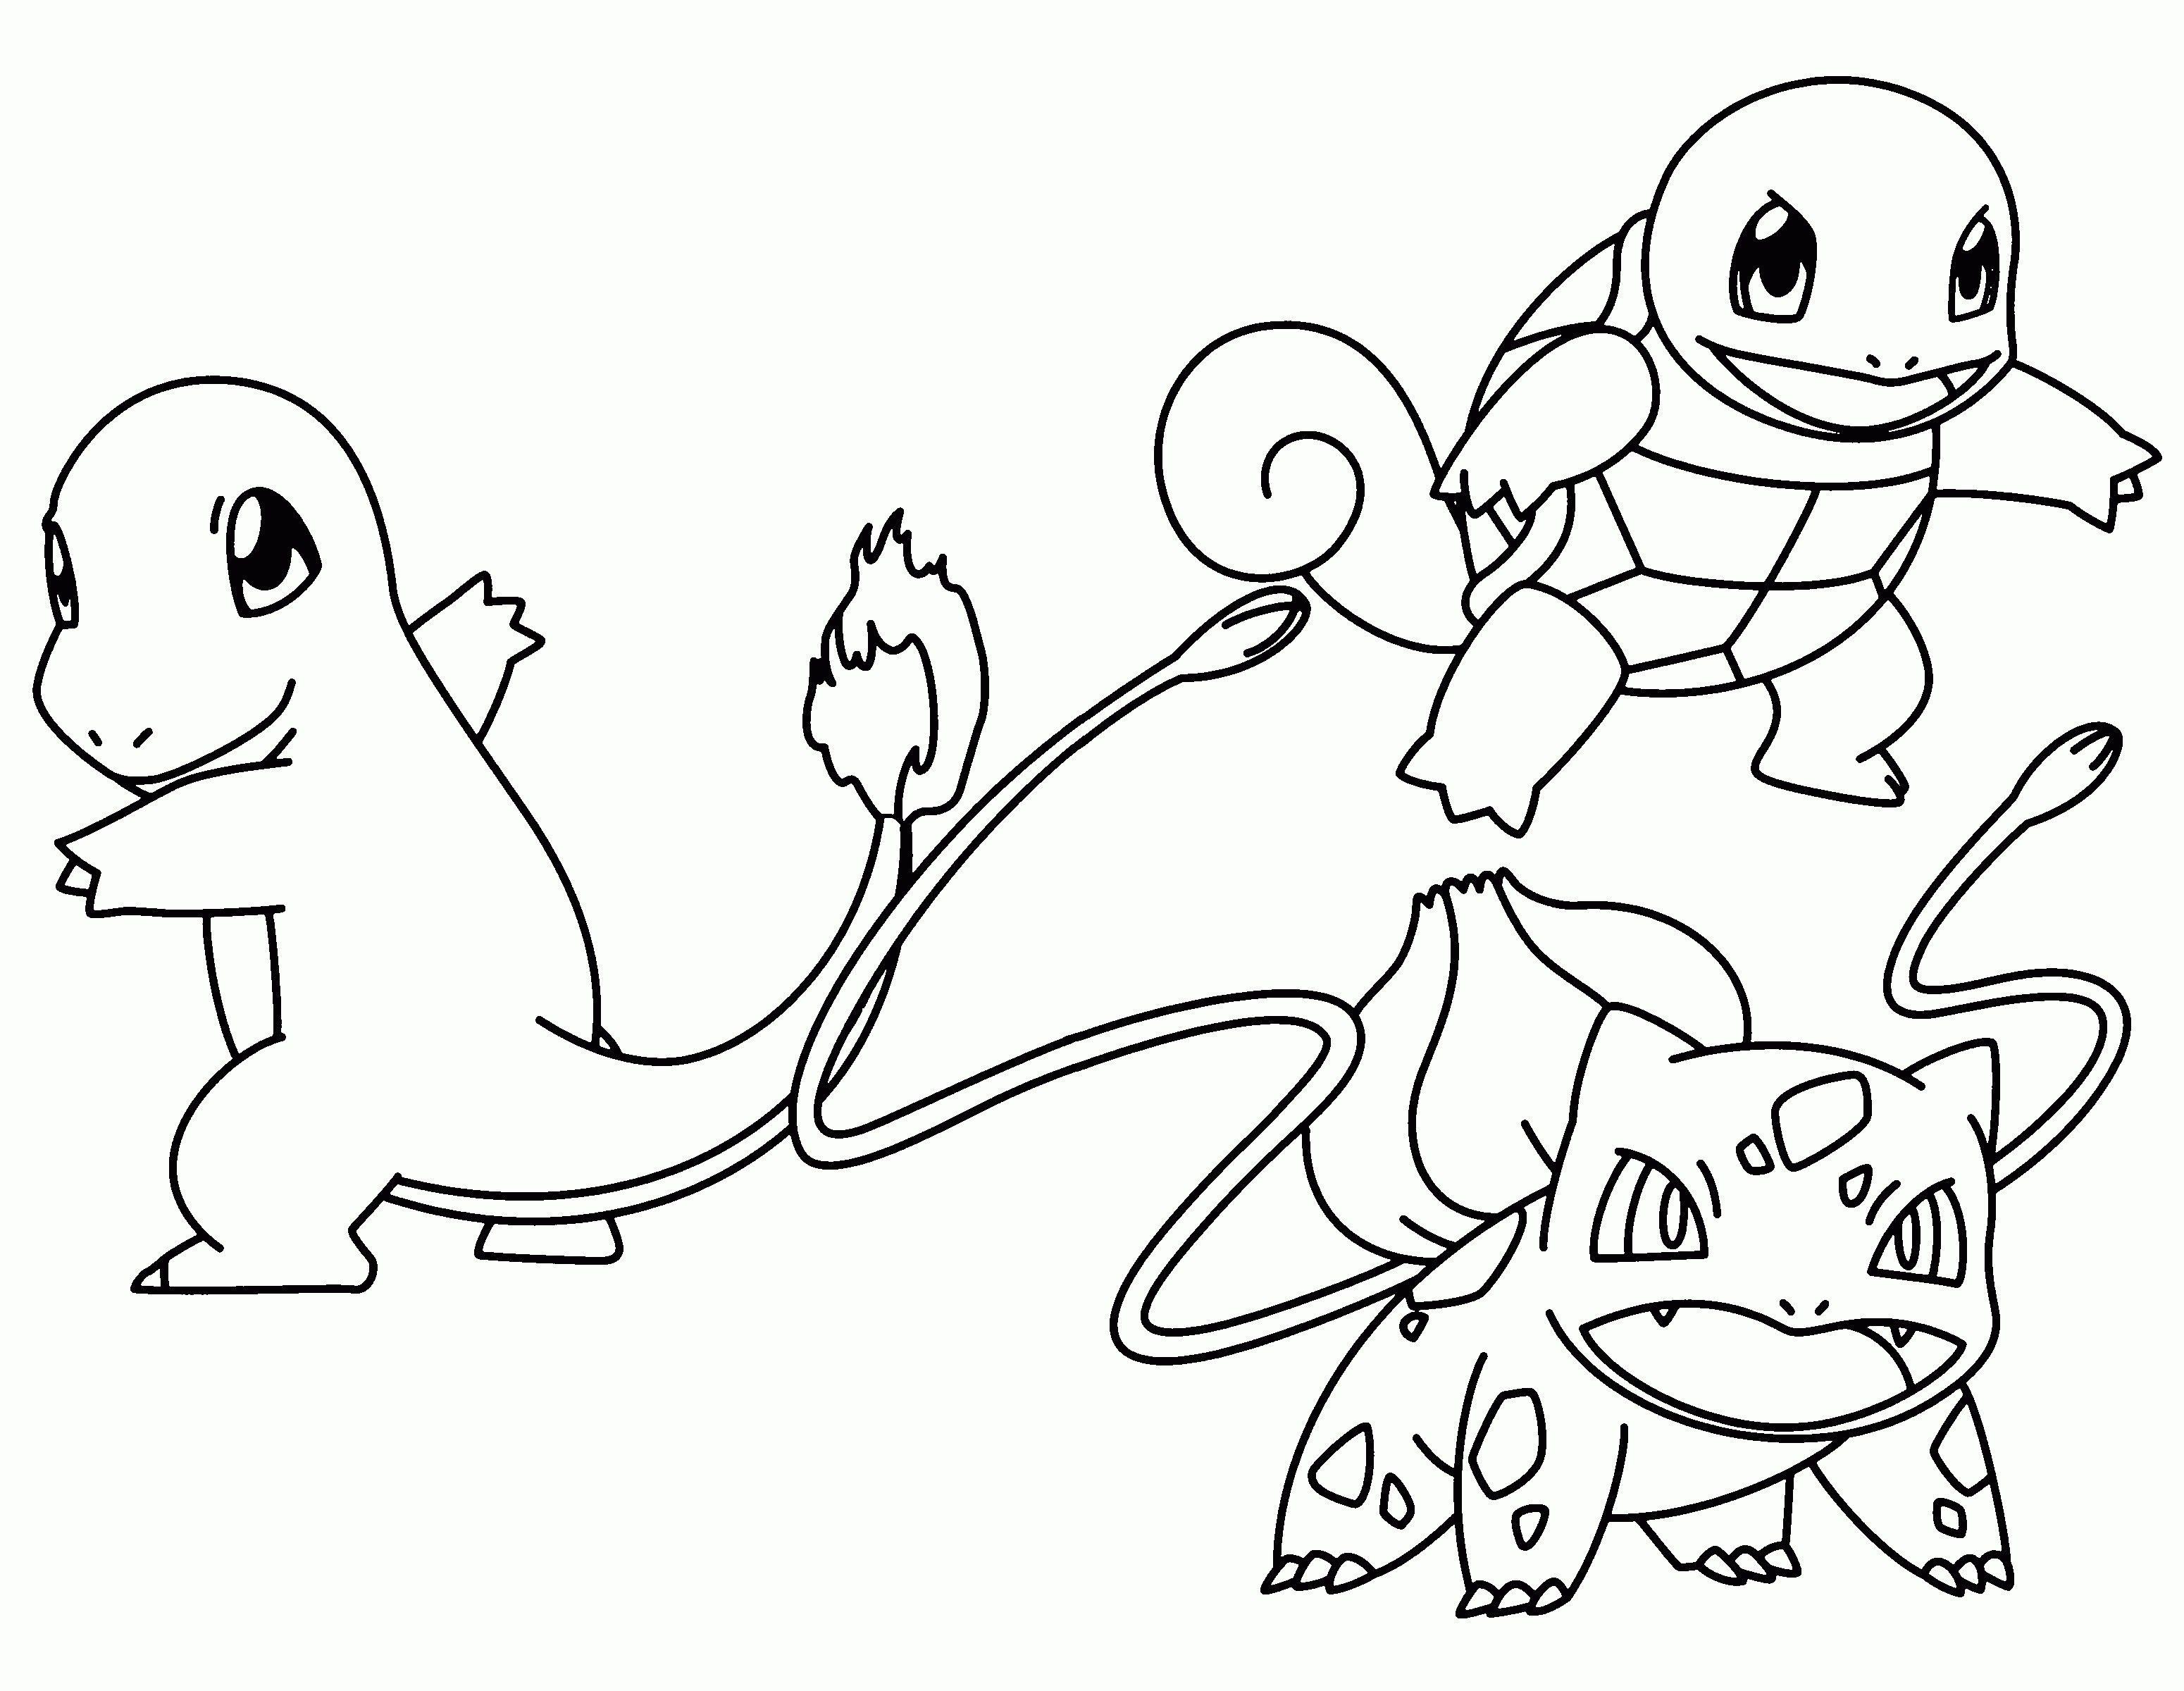 Charmander Coloring Page Pokemon Charmander Coloring Pages Kids Coloring Page Entitlementtrap Com Pikachu Coloring Page Pokemon Coloring Pages Pokemon Coloring